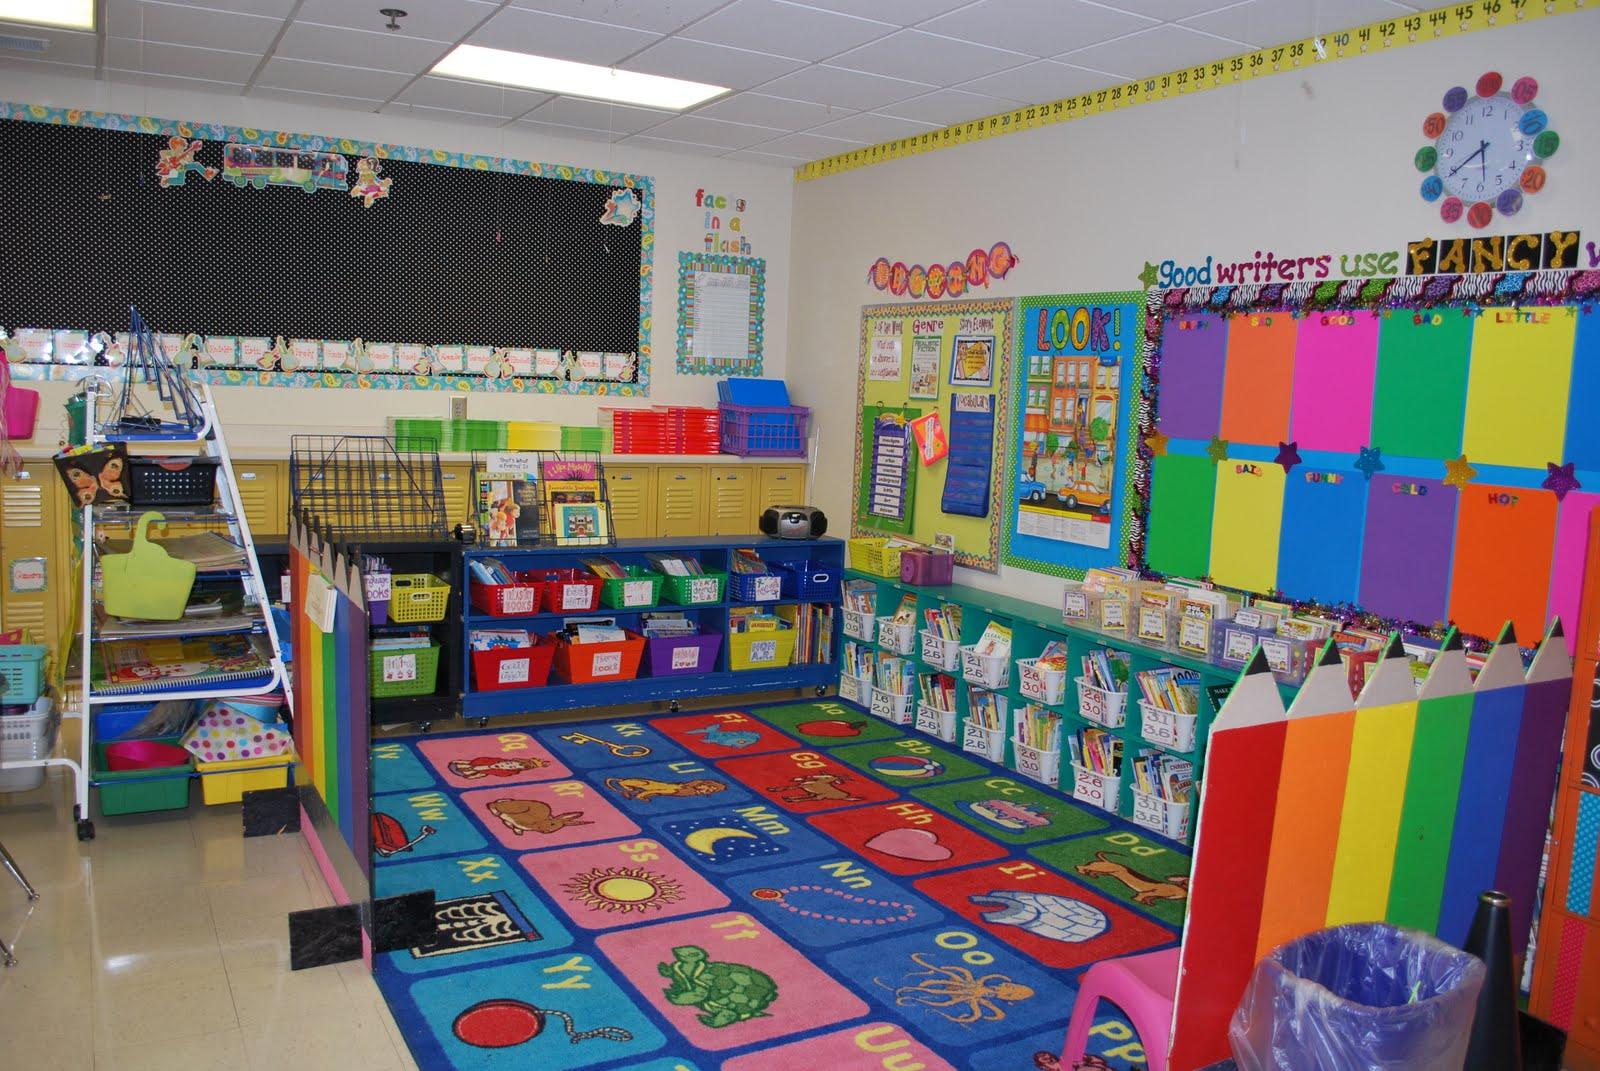 Pusat Asuhan Dan Kanak Yang Baru Belajar Untuk Bilik Darjah